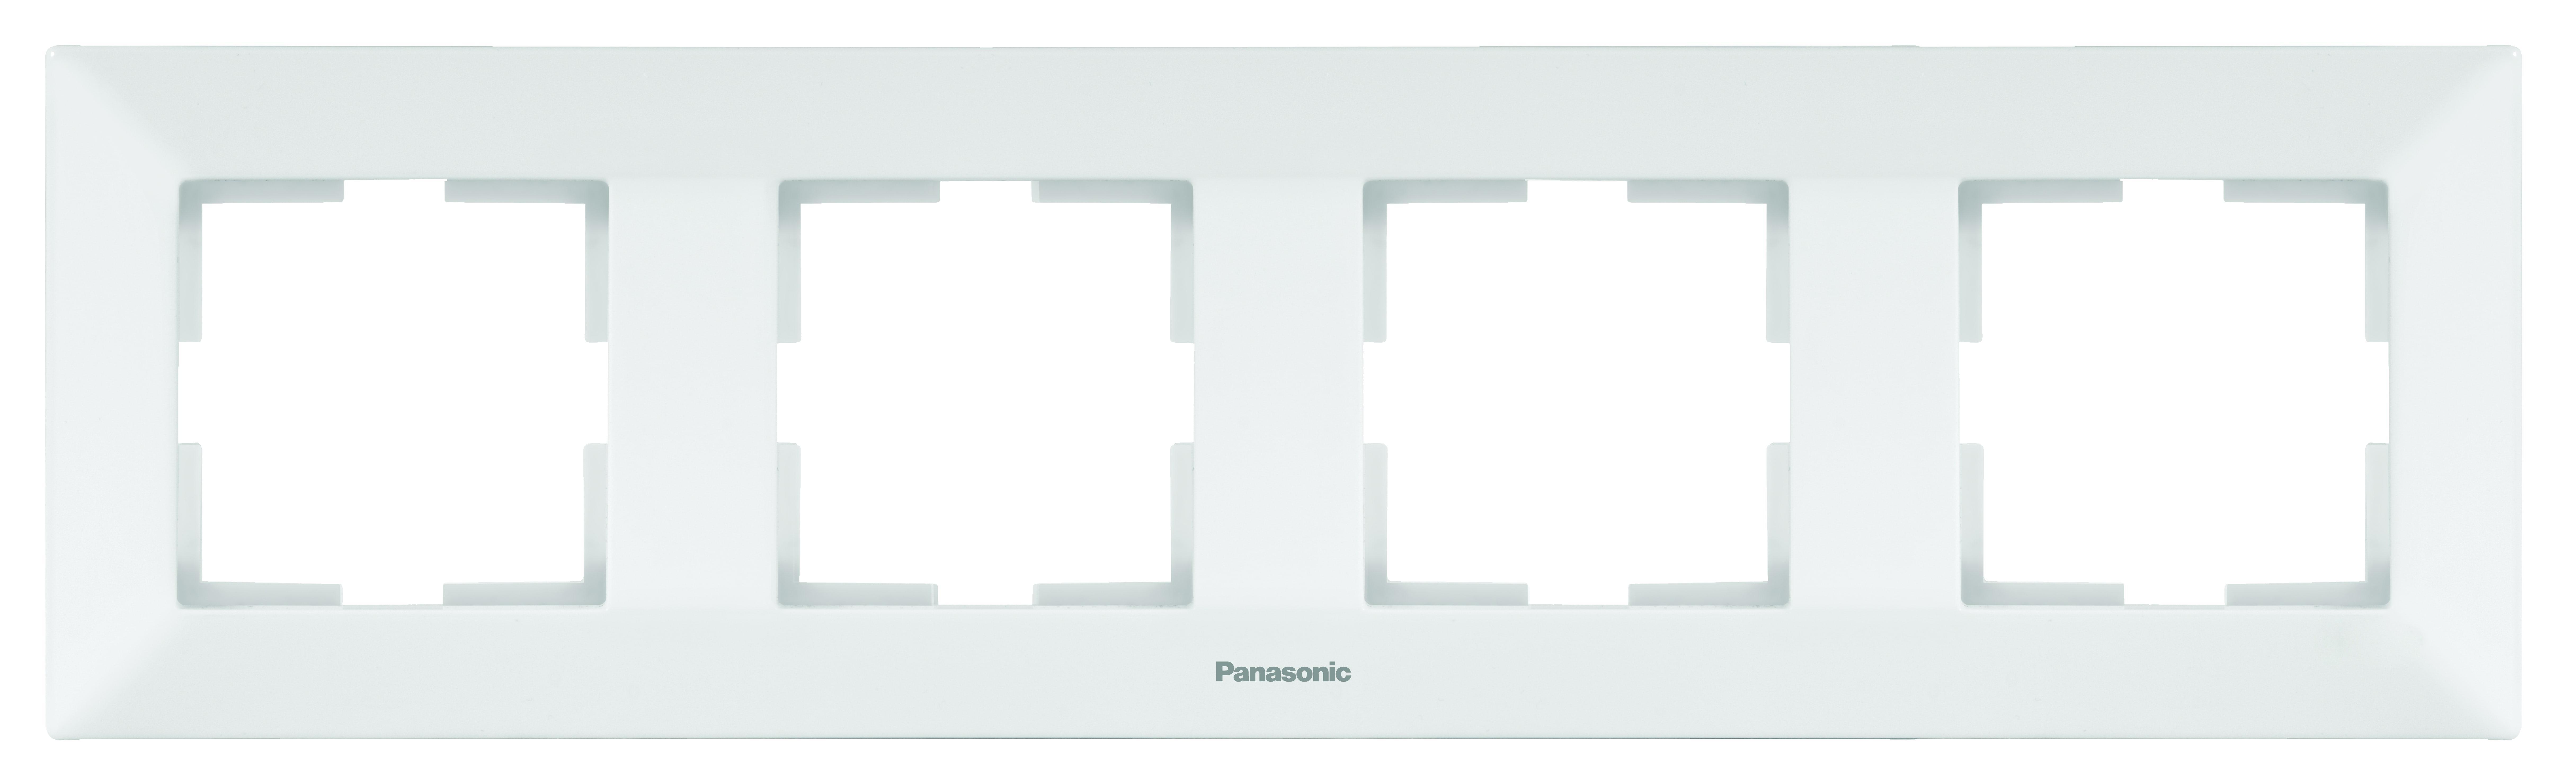 Рамка Panasonic Wktf0803-2bg-res arkedia свч panasonic nn st251wzte 700 вт белый